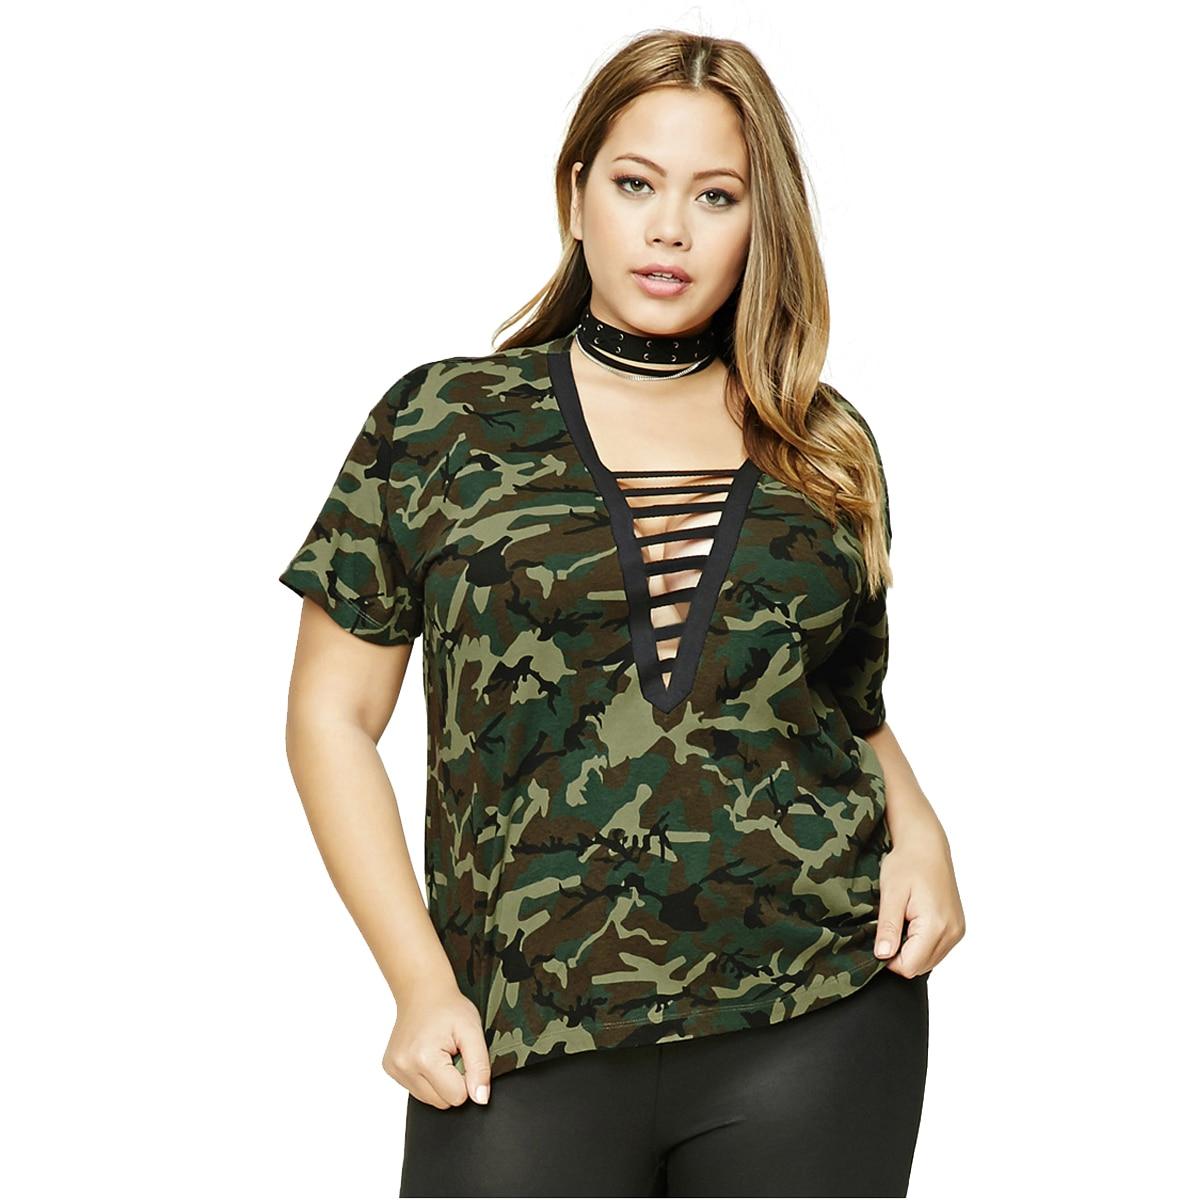 2017 Big Size New Fashion font b Women b font font b Clothing b font Sexy online get cheap womens camouflage clothing aliexpress com,7xl Womens Clothing